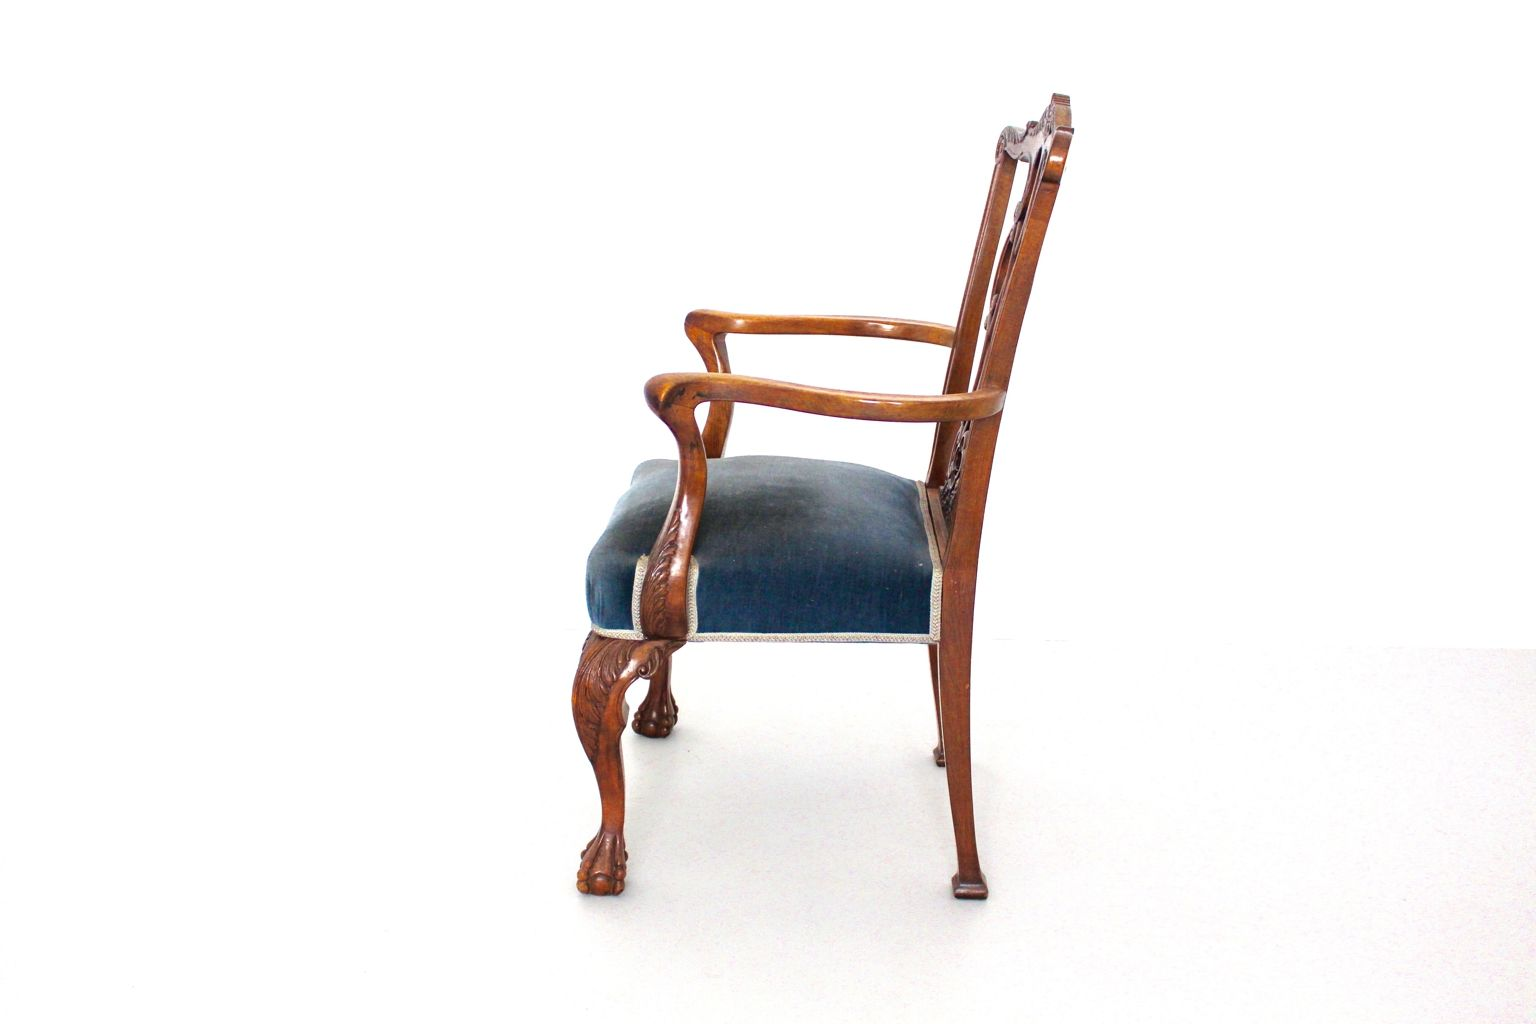 armlehnstuhl im chippendale stil 1920er bei pamono kaufen. Black Bedroom Furniture Sets. Home Design Ideas